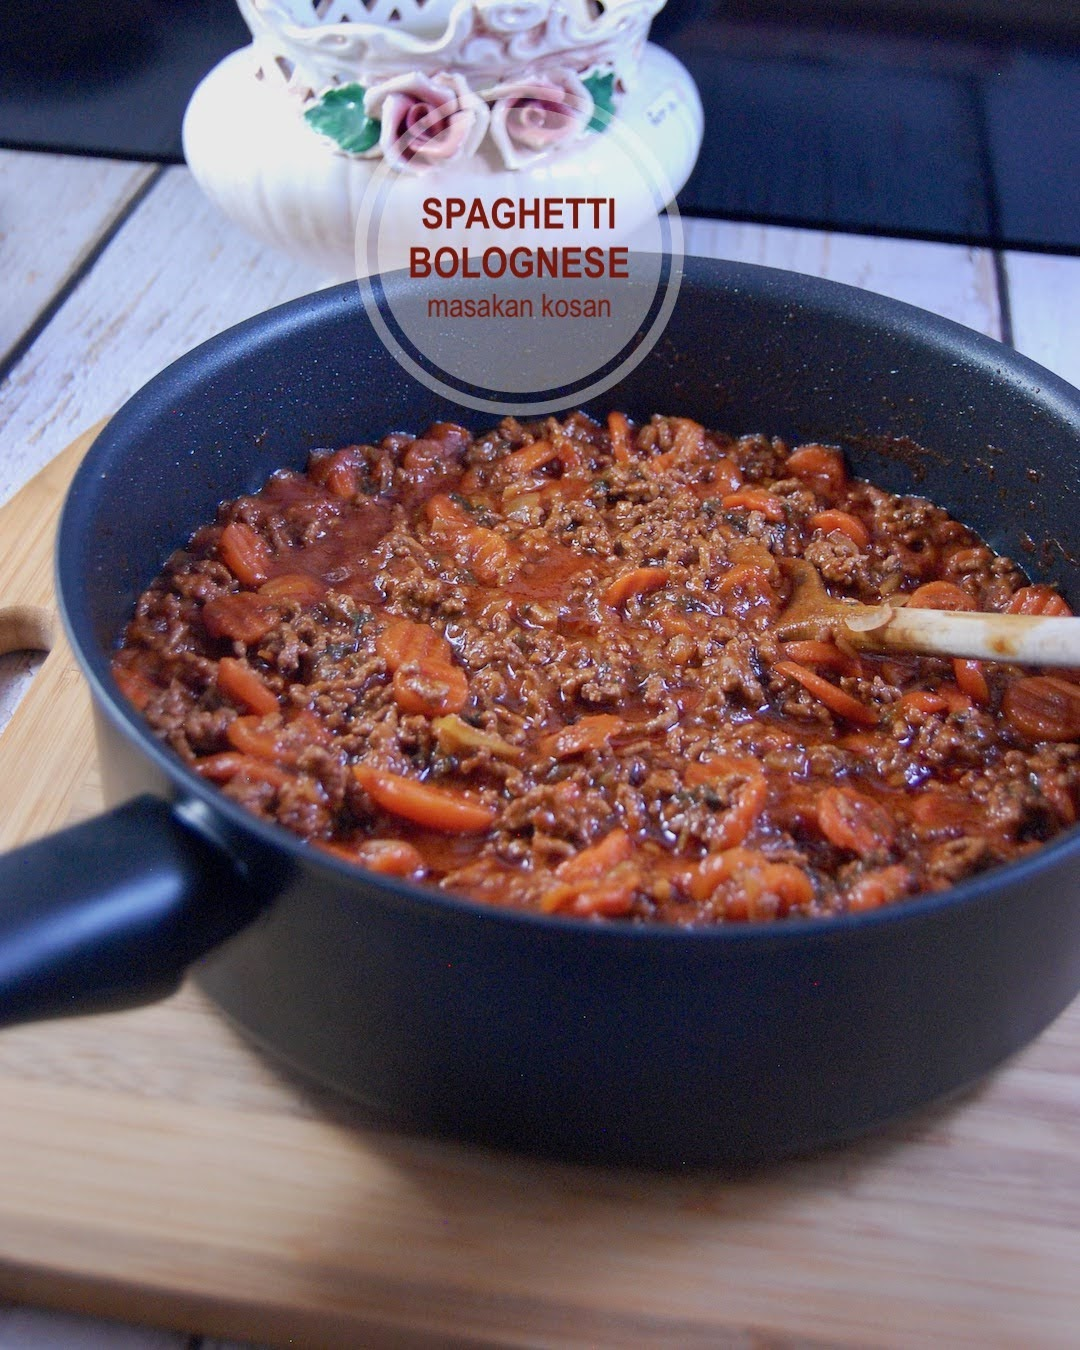 Resep Spaghetti Bolognese Praktis ala Anak Kos Cepat dan Lezat